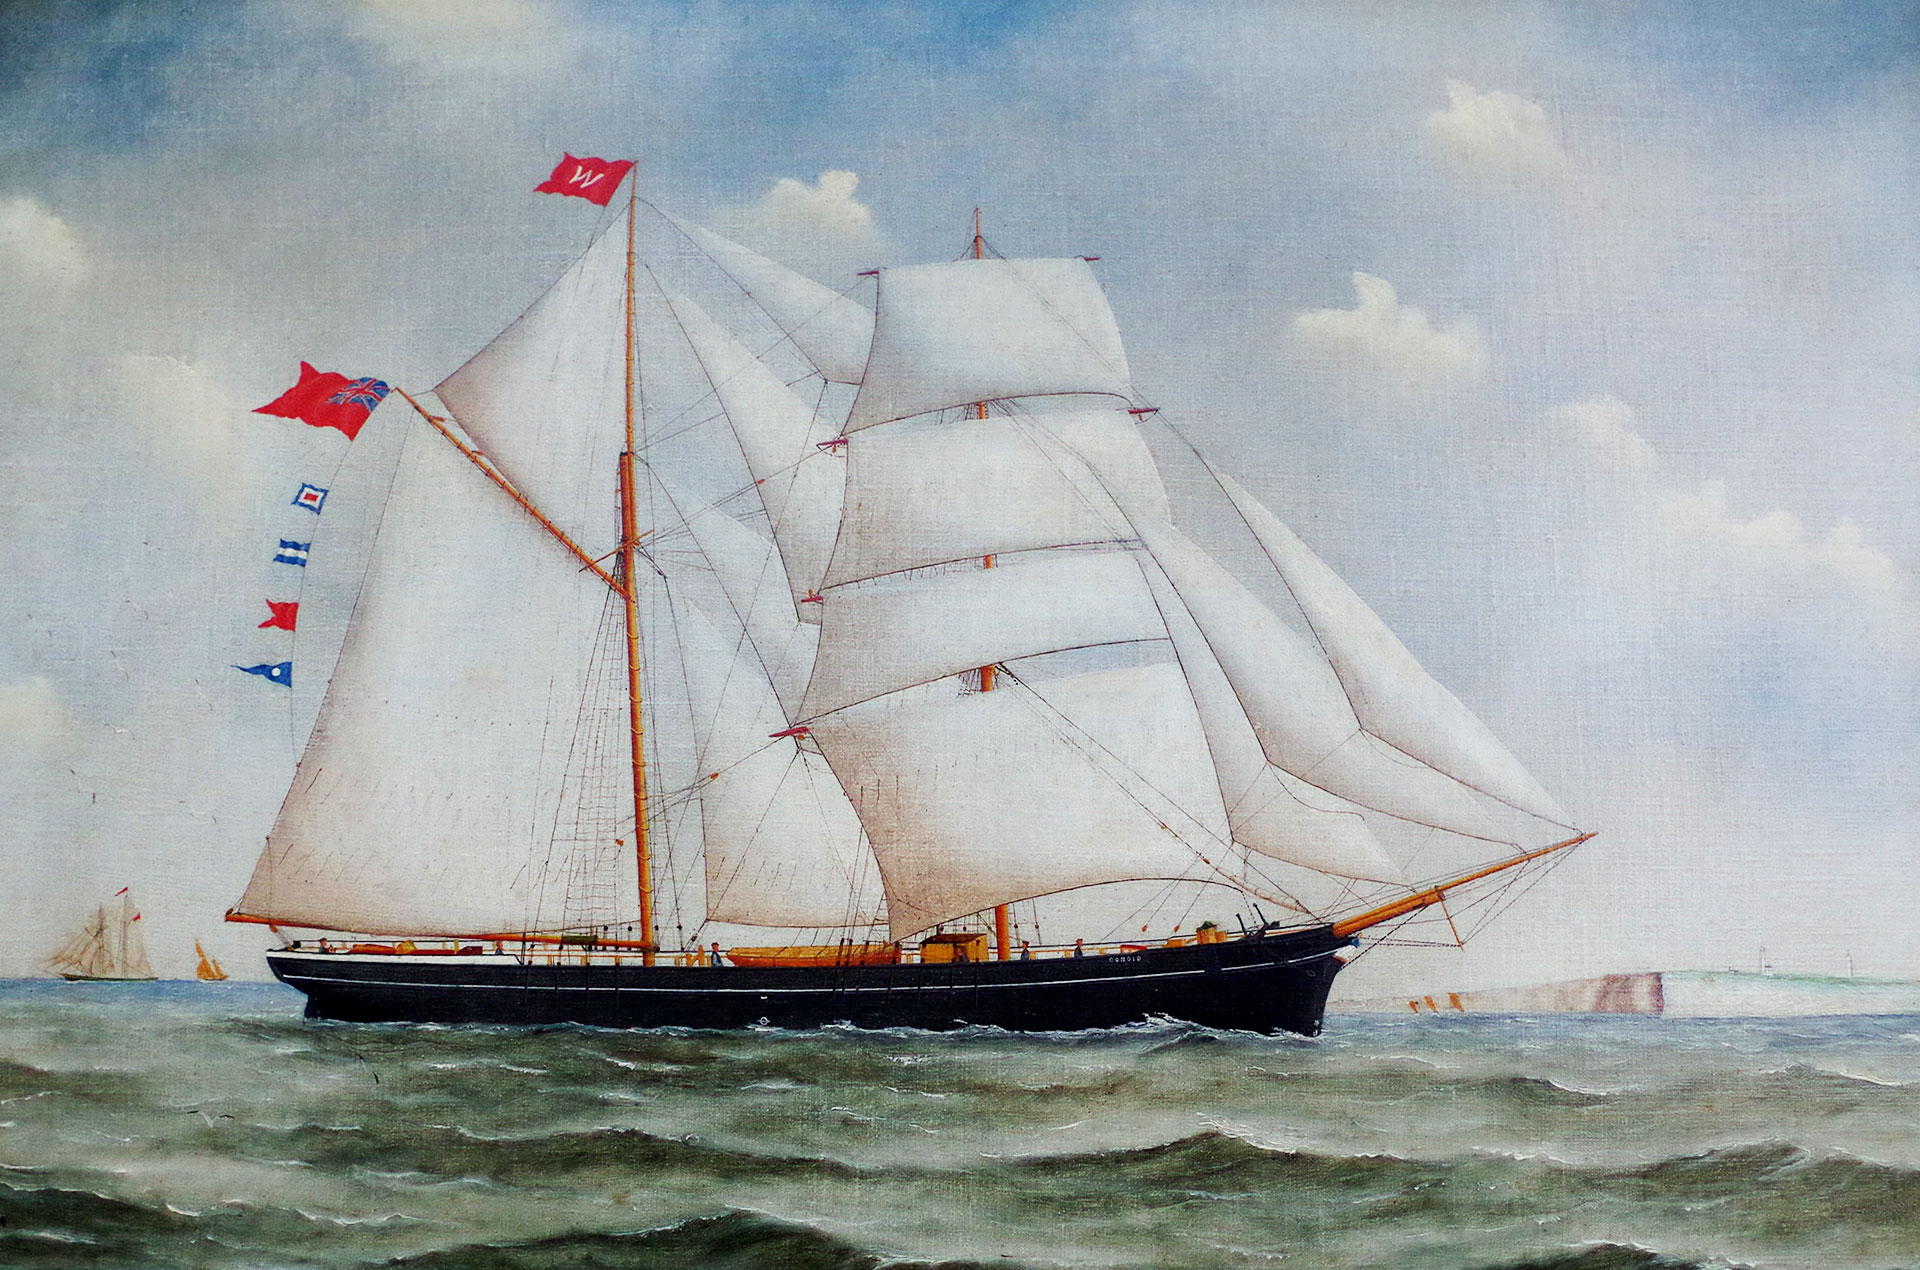 Brigantine Conoid - Whitstable Shipping Company - © Jonathan Aylen